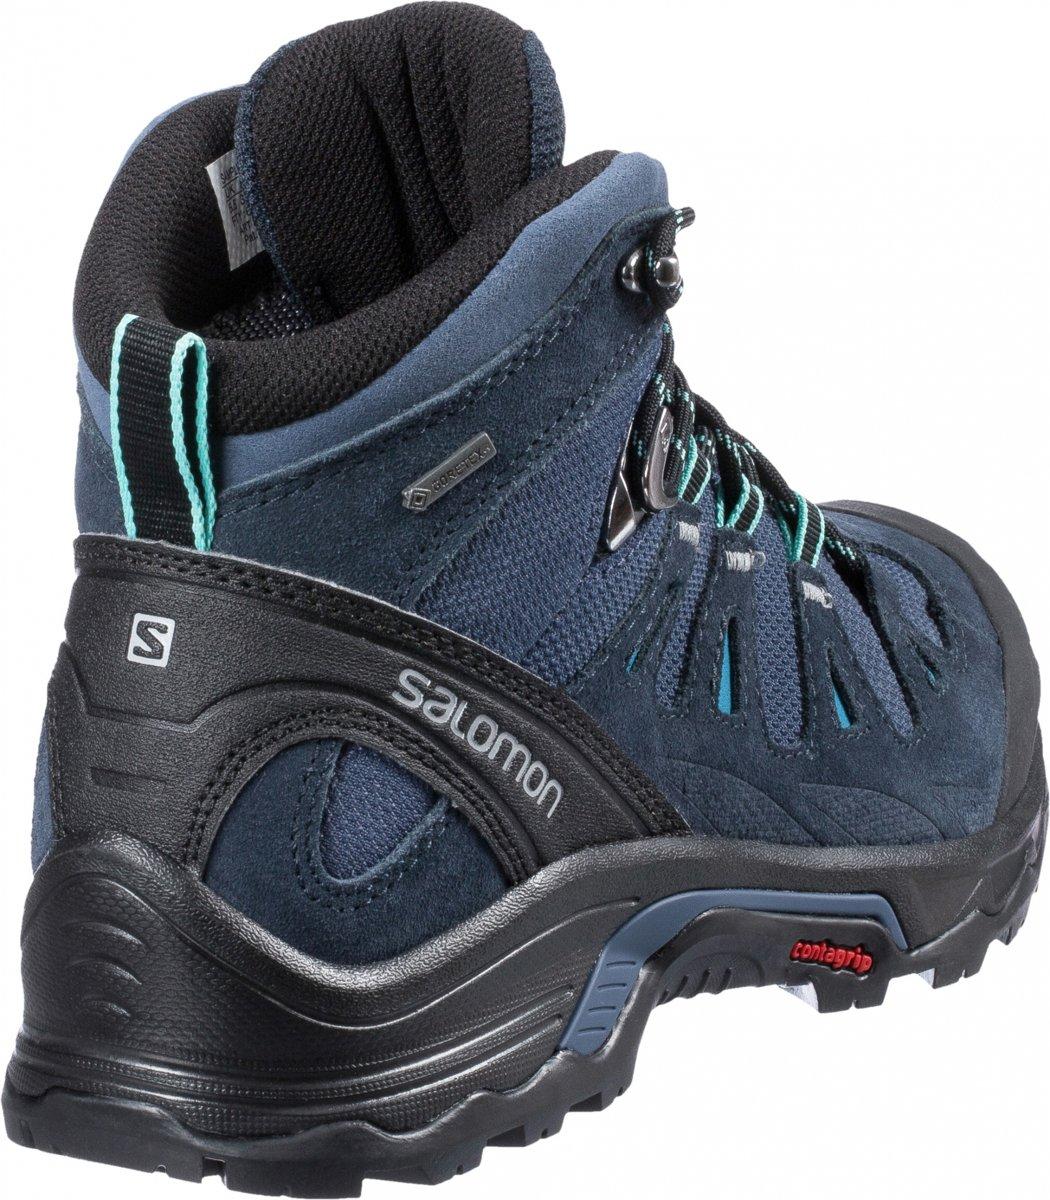 66ca07c9147 bol.com   Salomon Quest Prime GTX - Wandelschoenen - Dames - 38 -  blauw;zwart